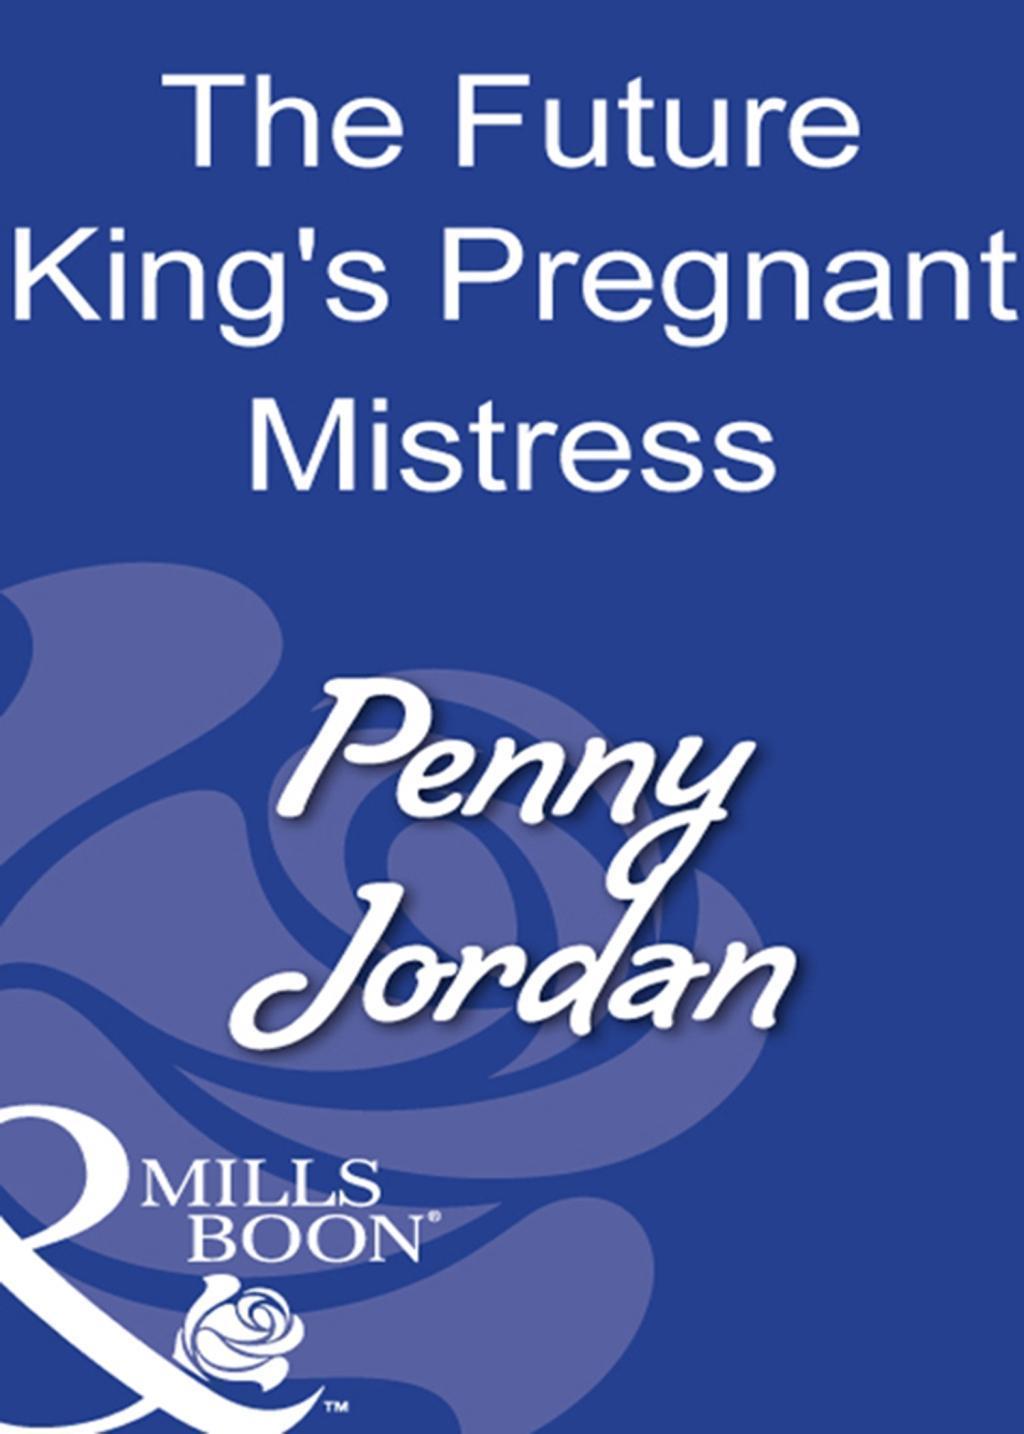 The Future King's Pregnant Mistress (Mills & Boon Modern)